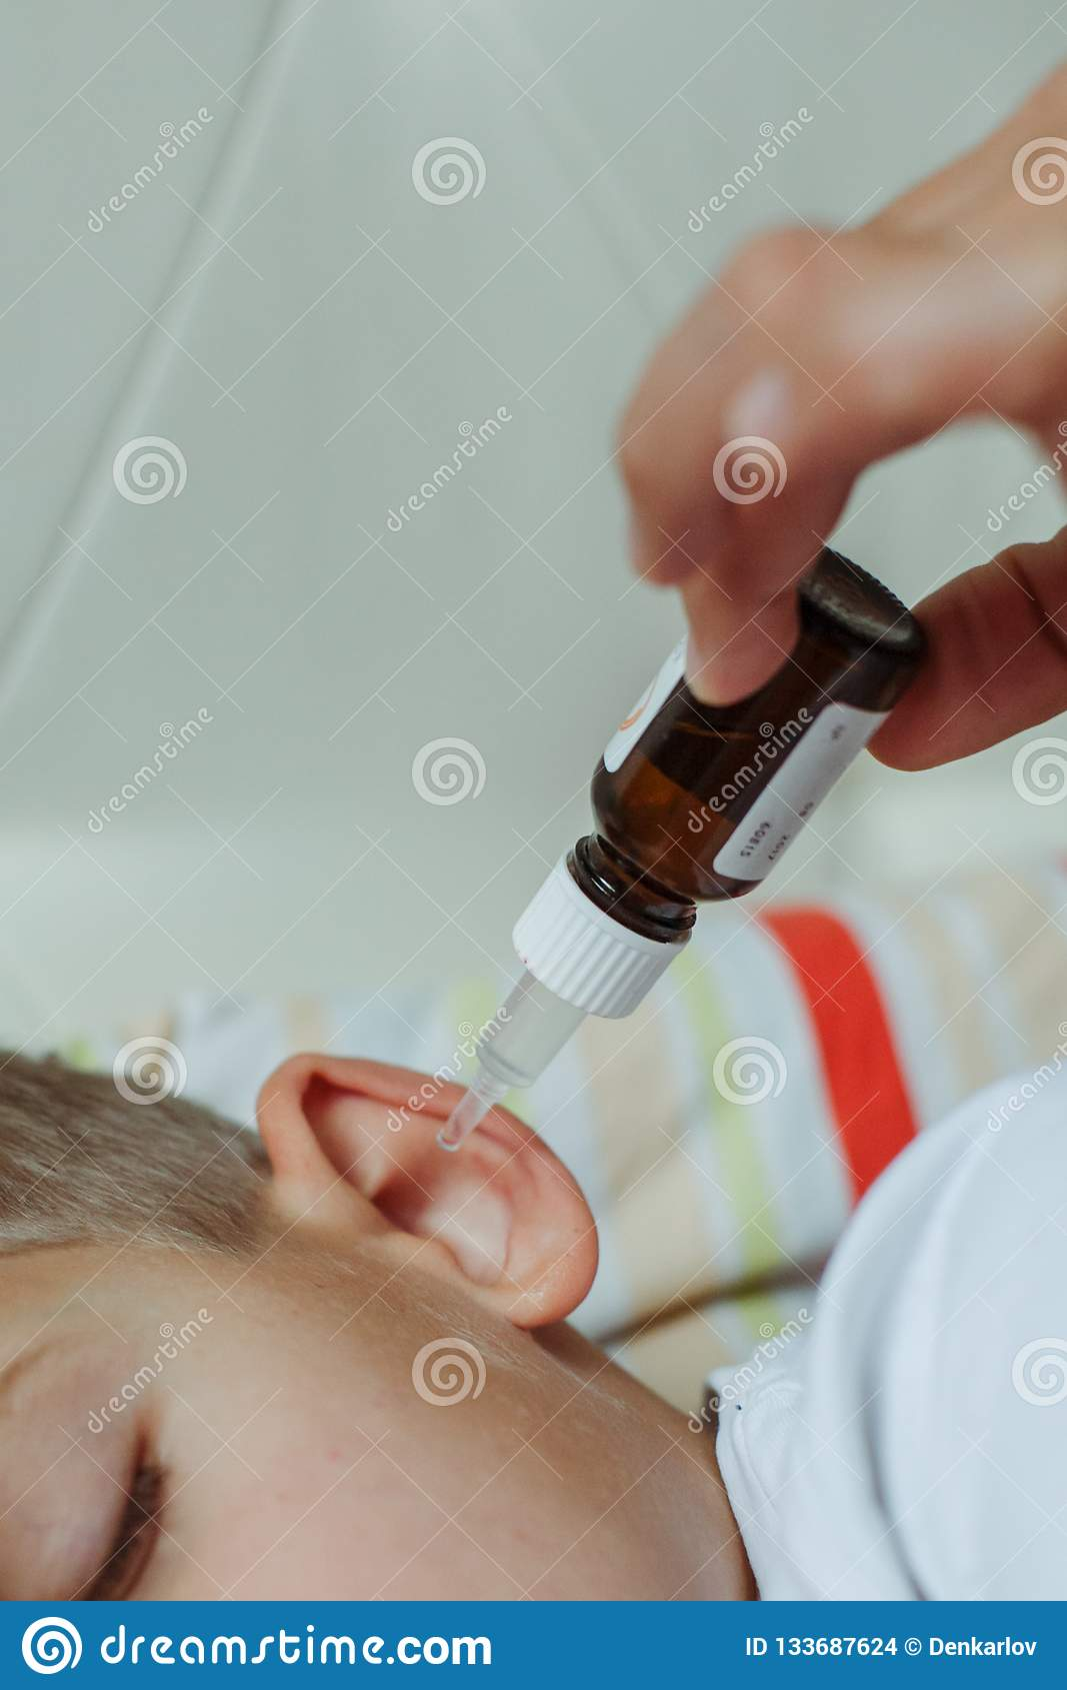 Childhood diseases